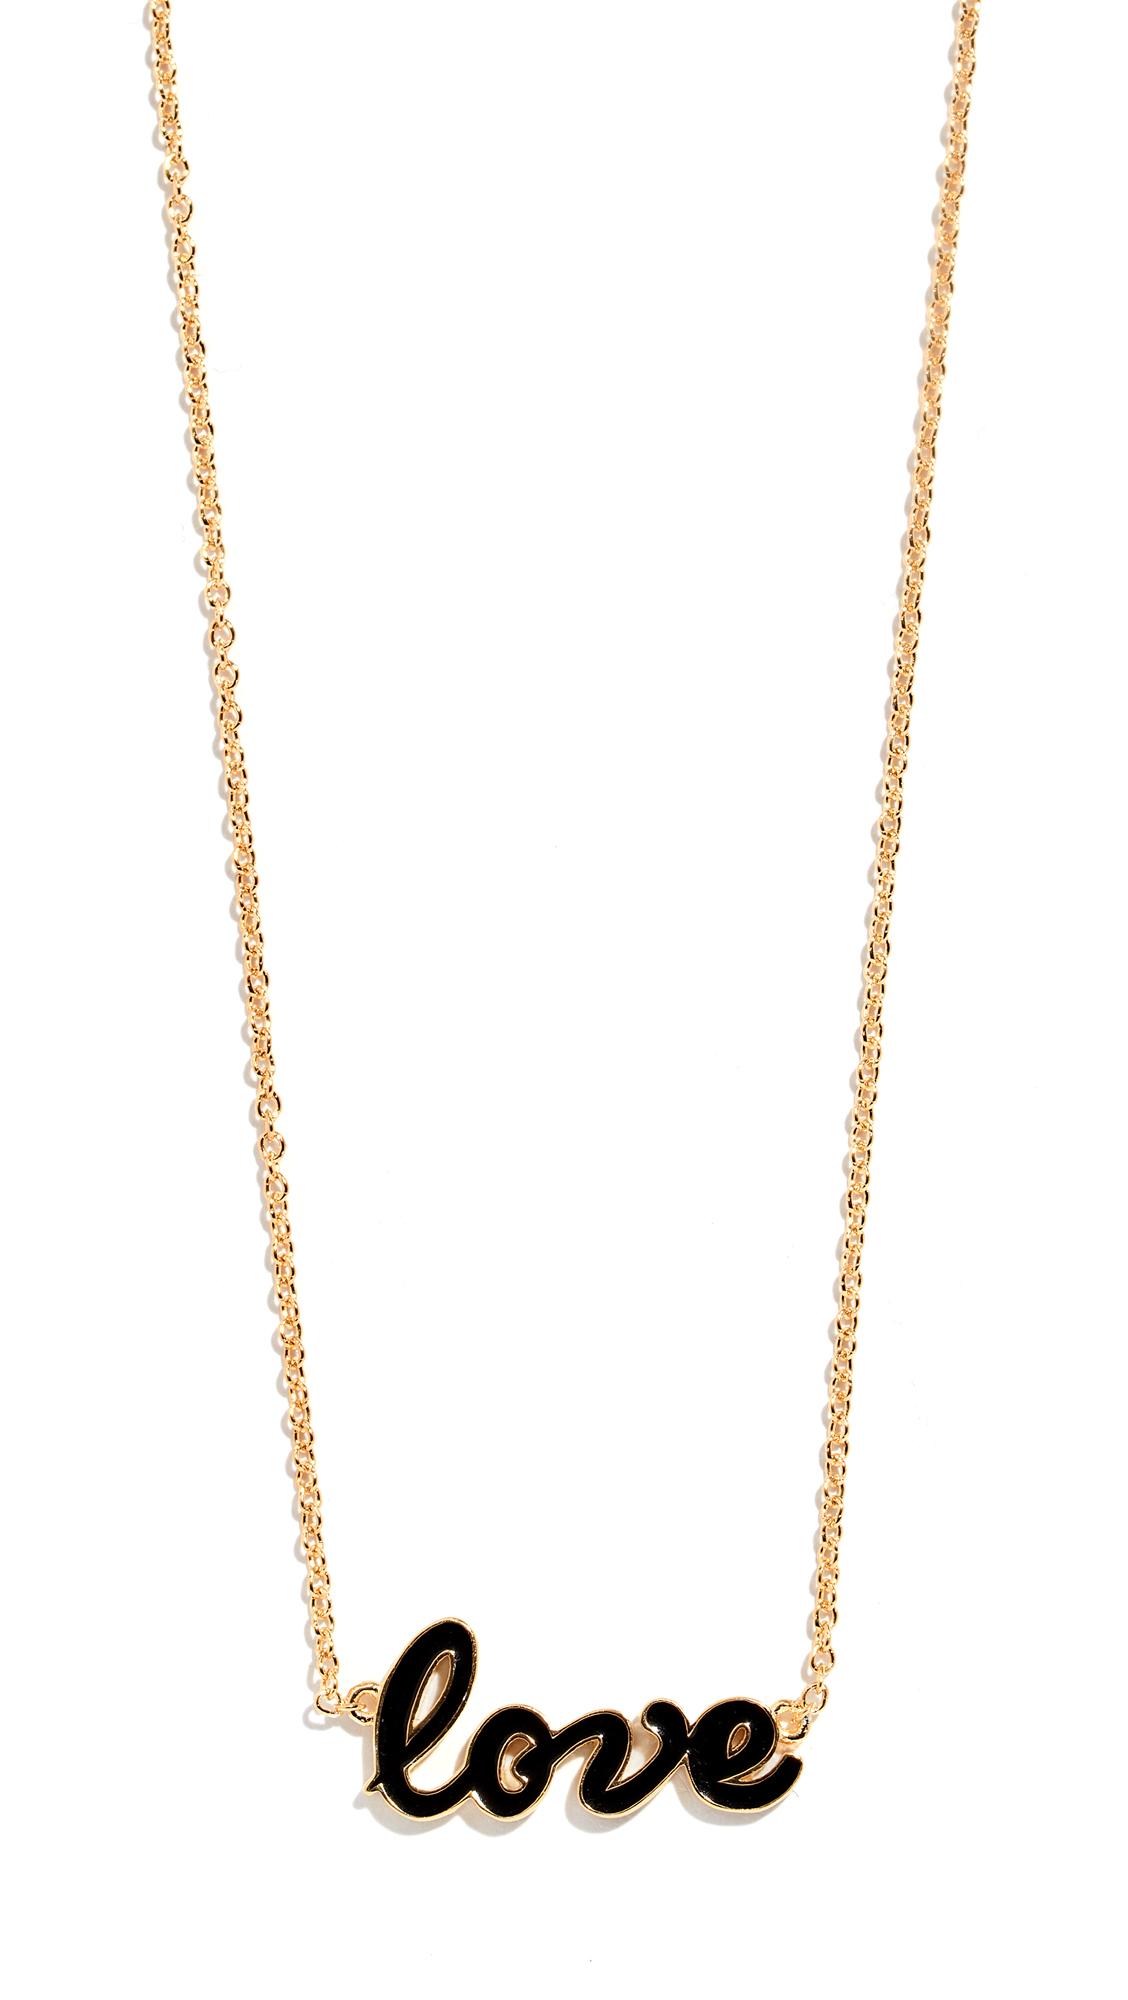 JENNIFER ZEUNER JEWELRY Addison Mini Enamel Necklace in Yellow Gold/Black